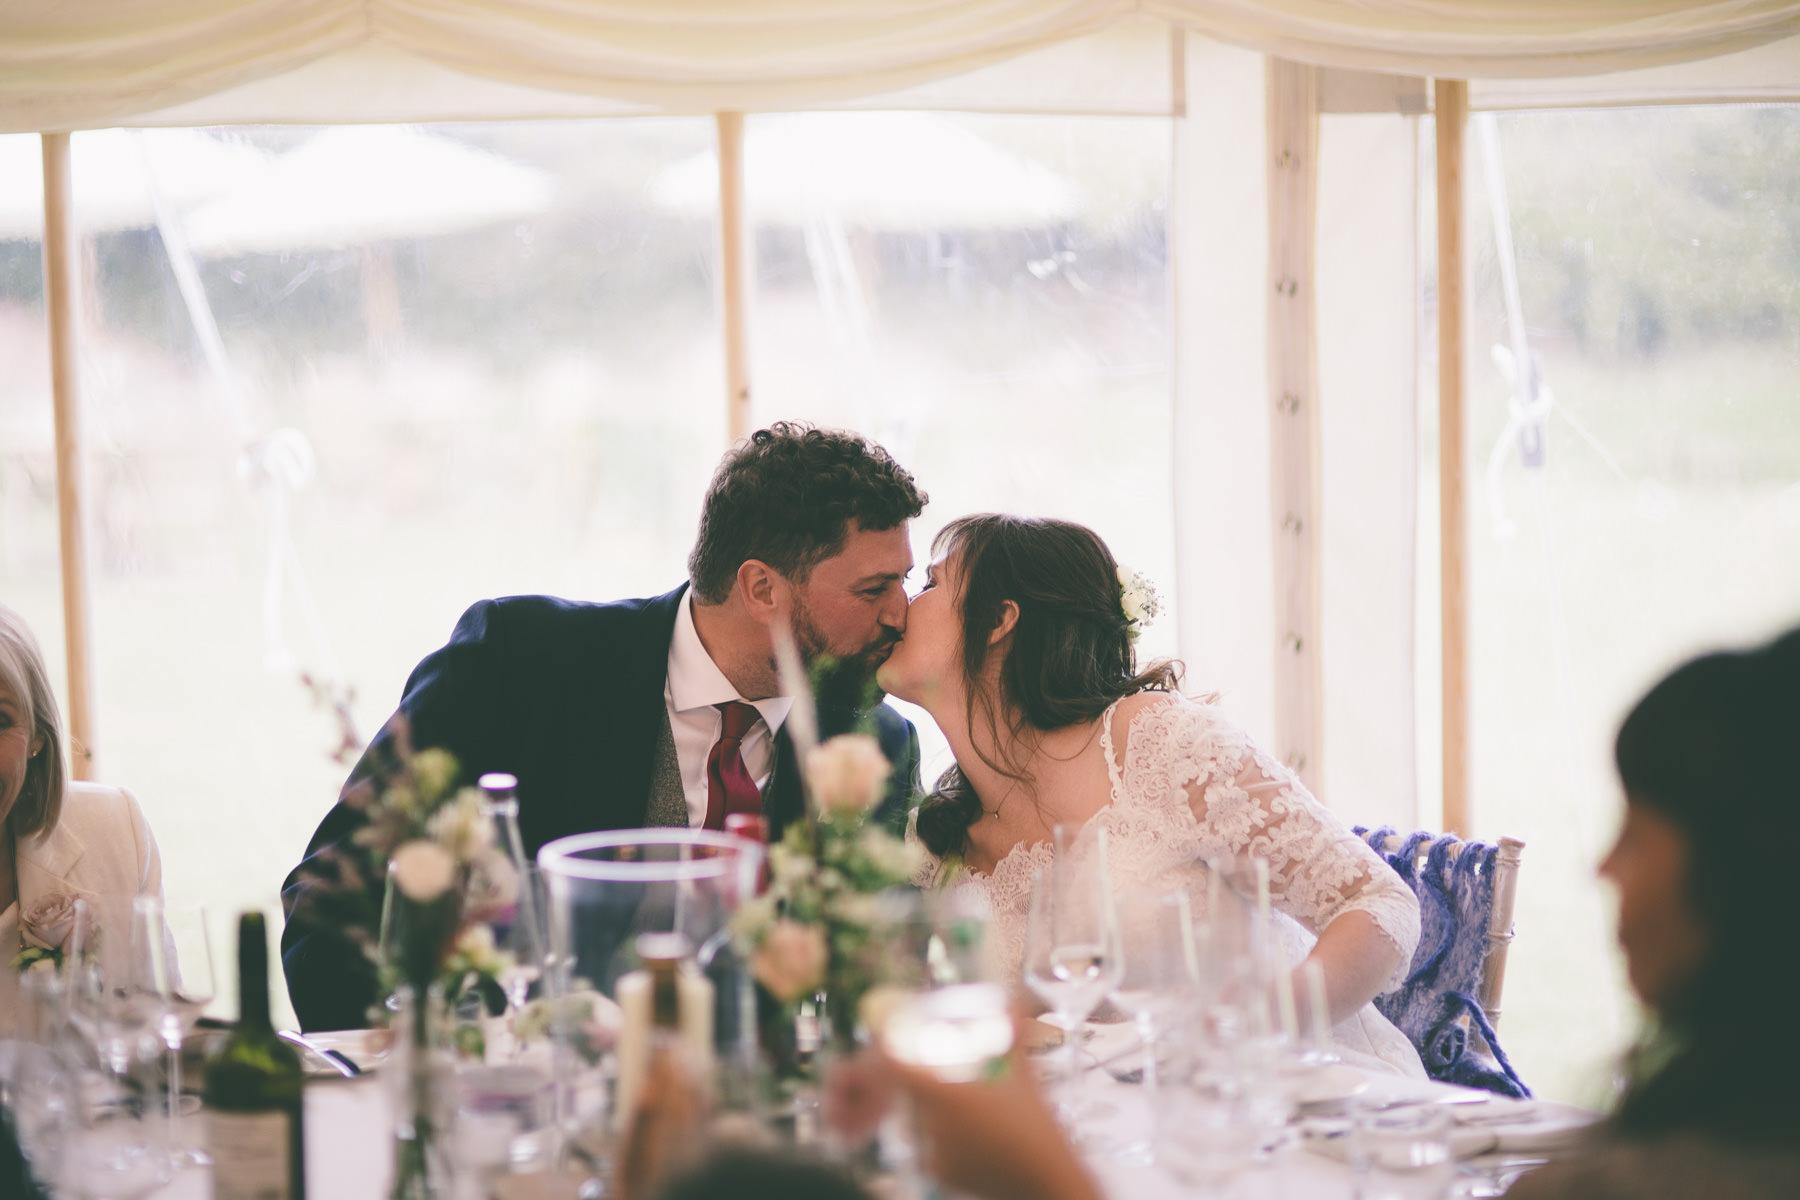 Pamber-Place-wedding-photography-basingstoke-hampshire-224